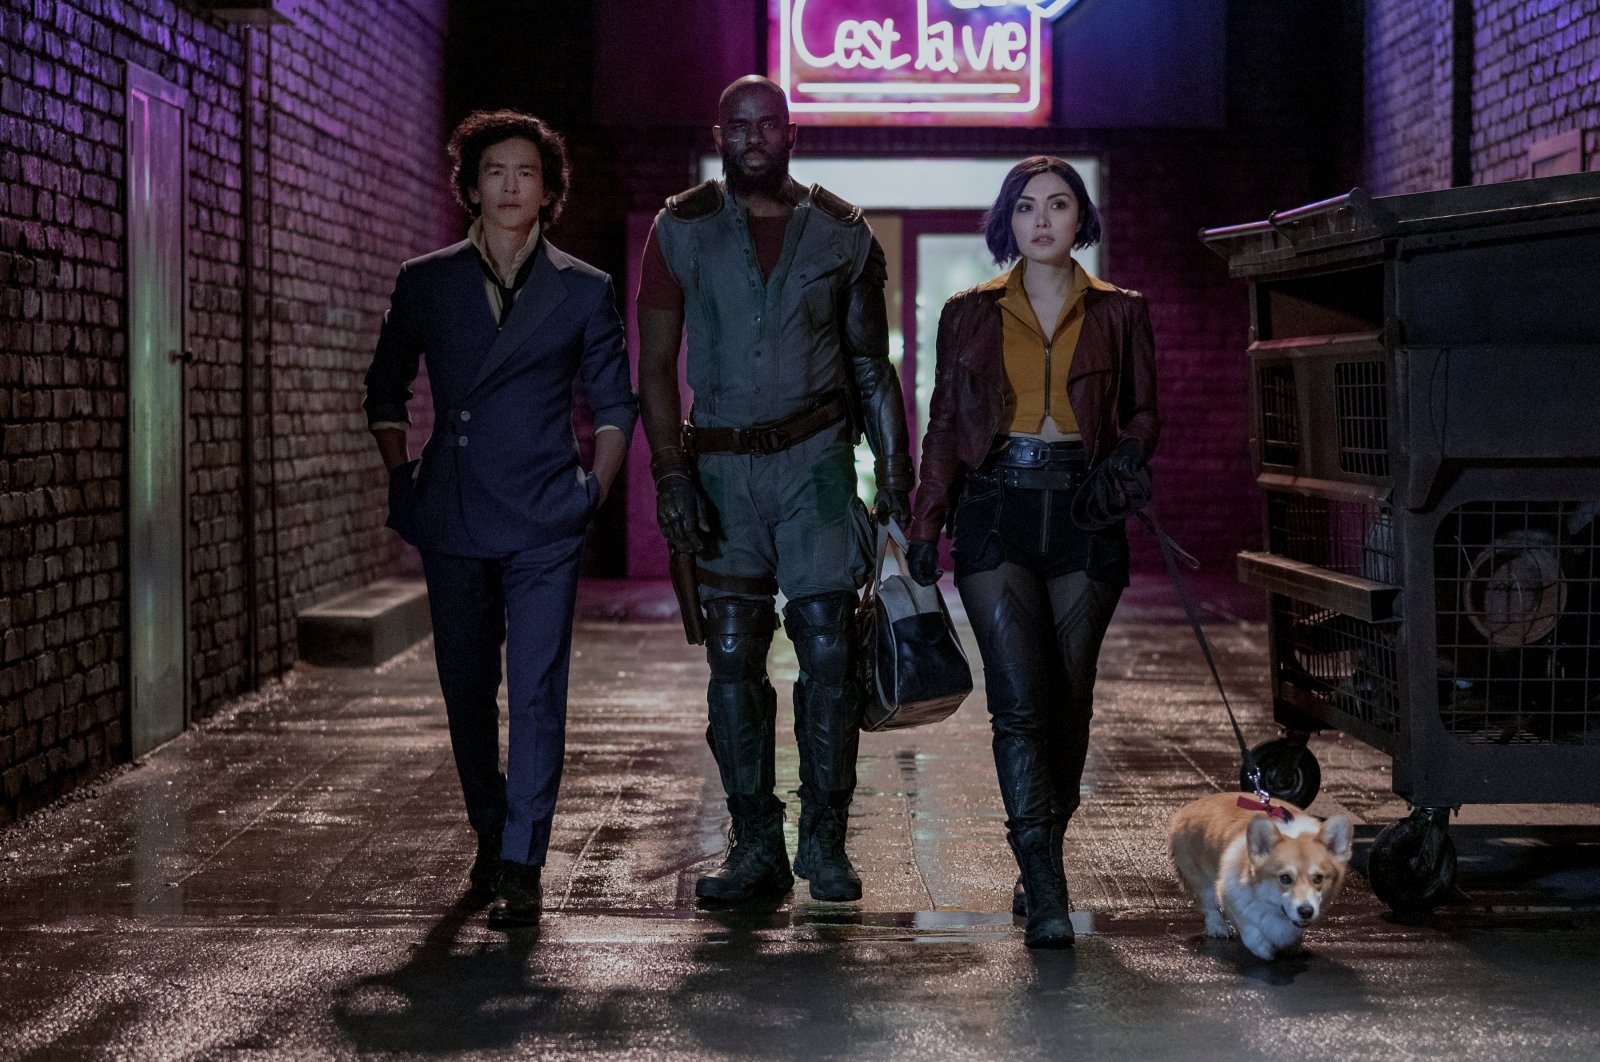 "John Cho as Spike Spiegel, Mustafa Shakir as Jet Black and Daniella Pineda as Faye Valentin in ""Cowboy Bebop,"" a highly anticipated anime adaptation set to arrive on Netflix in November. (DPA Photo)"